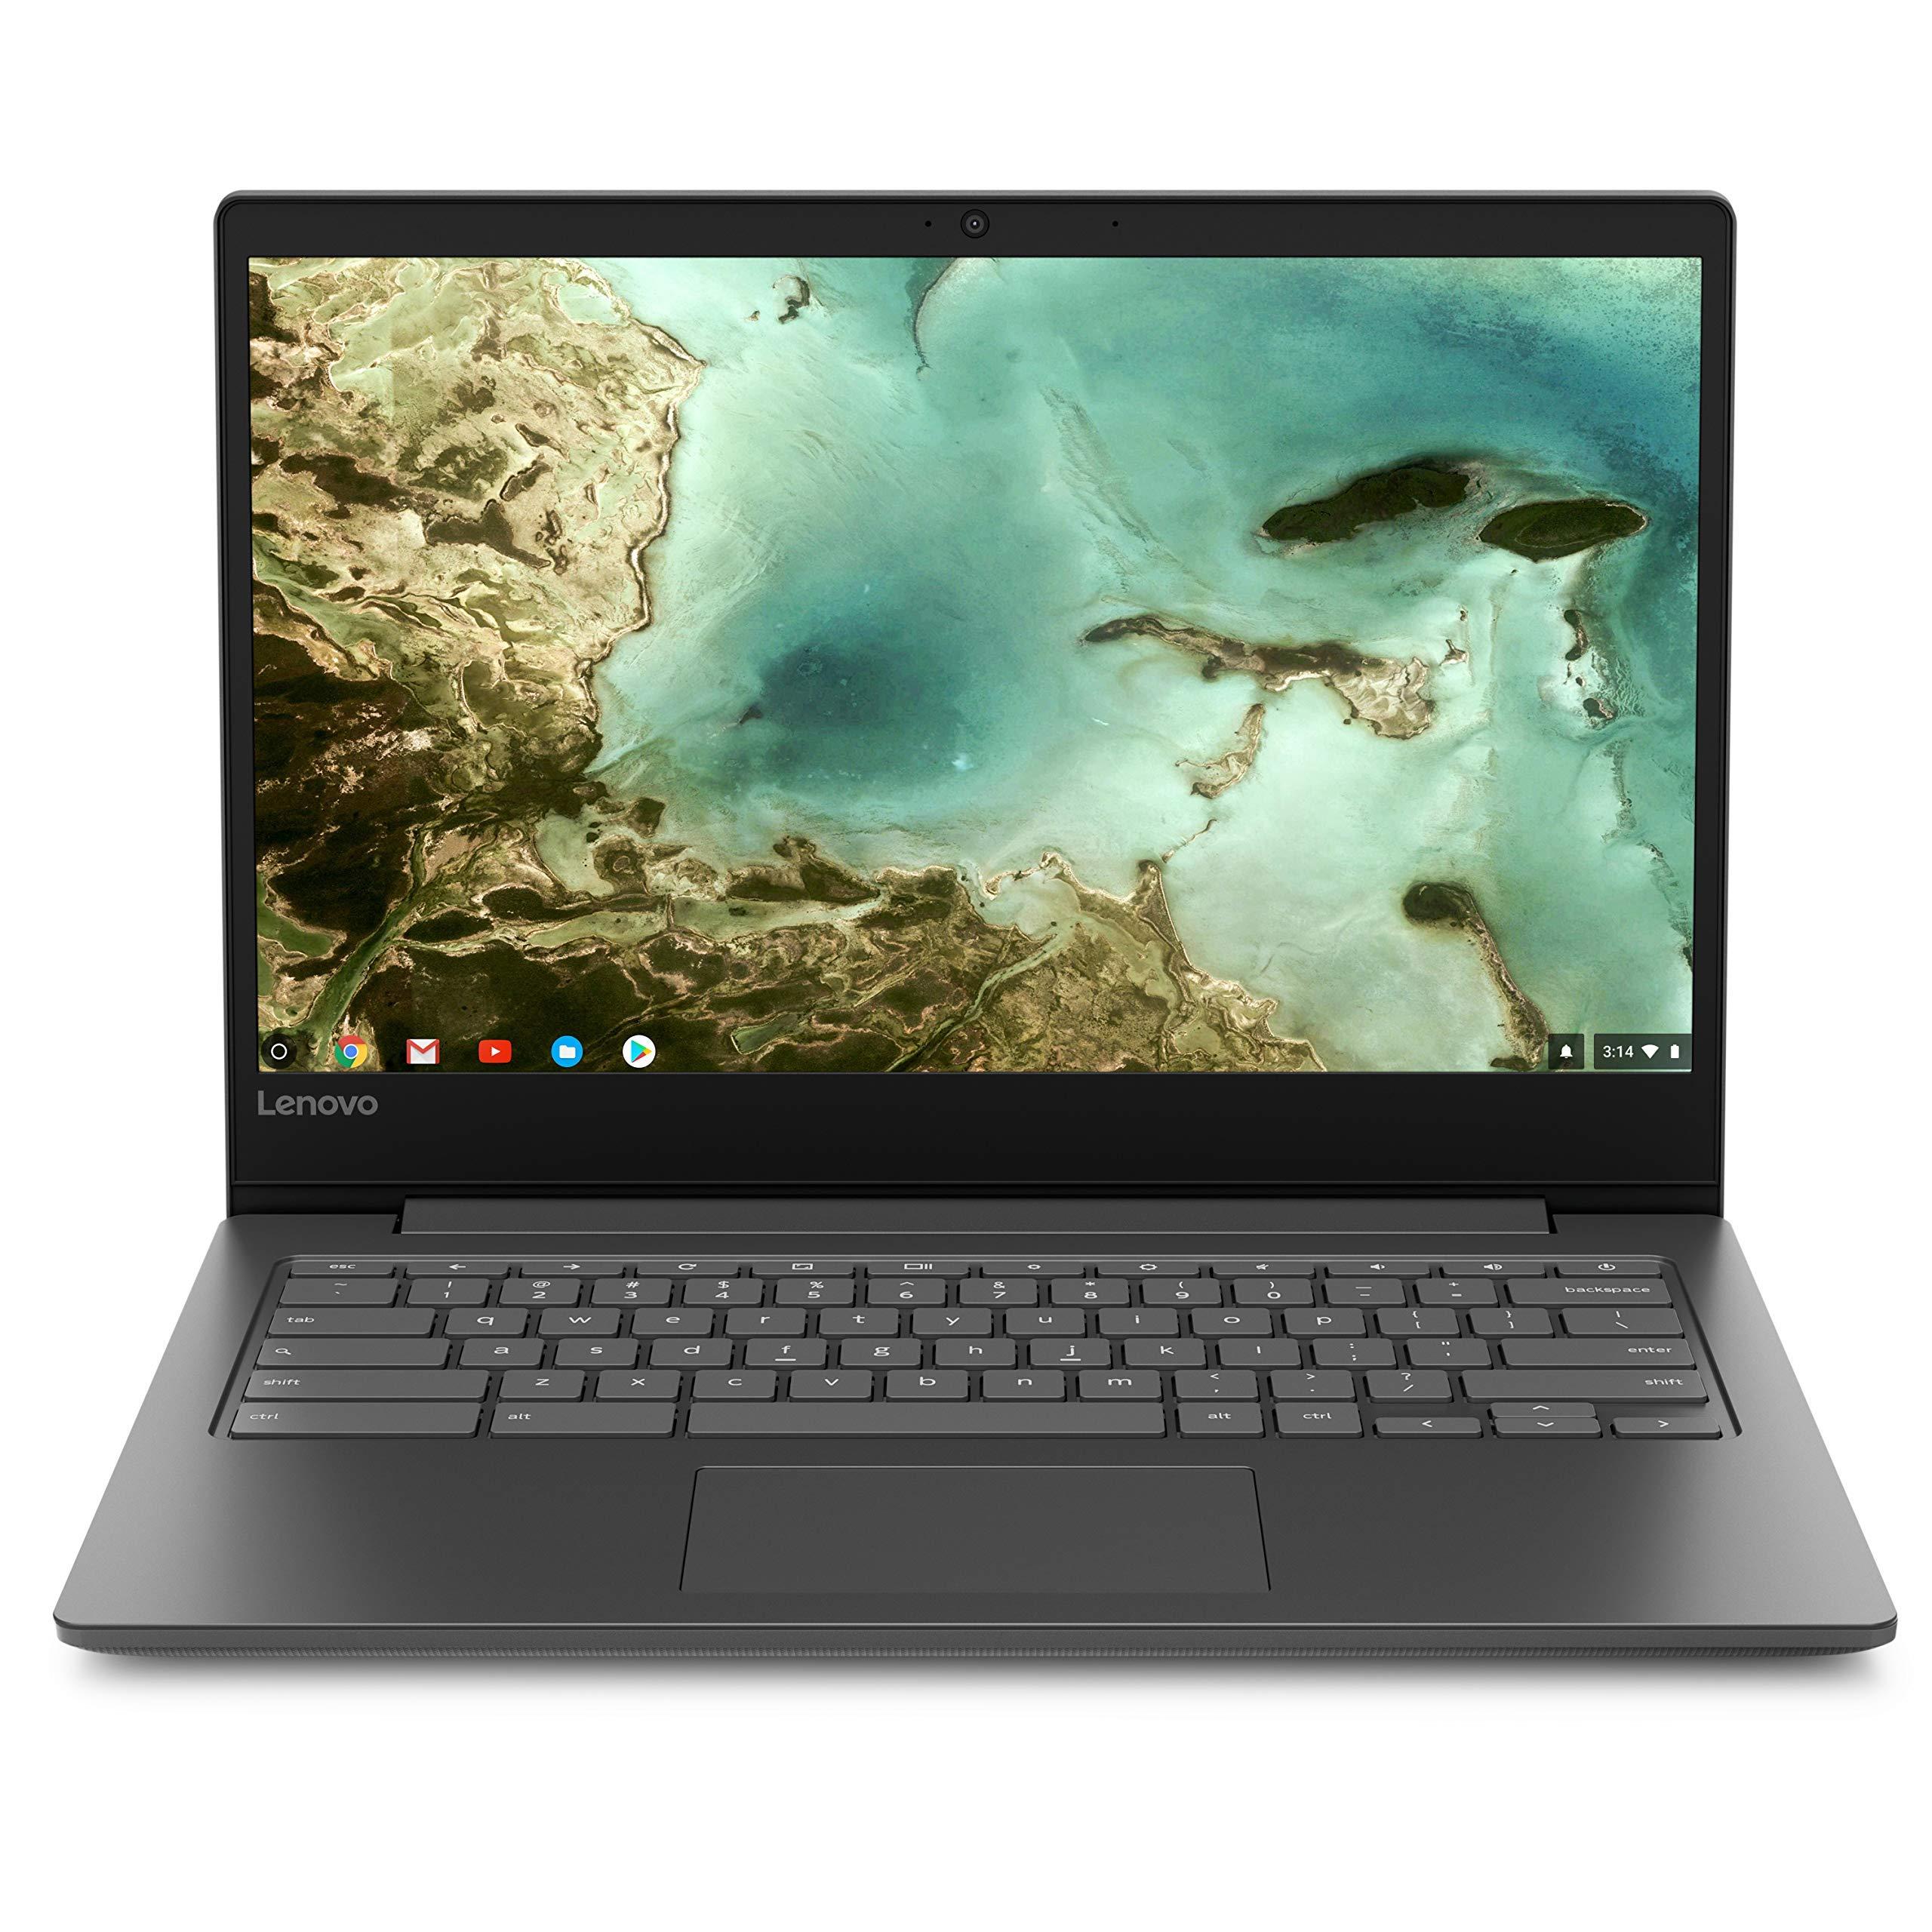 Newest Lenovo Flagship Chromebook S330, 14'' HD Display, MediaTek MT8173C Processor, 4GB Memory, 32GB eMMC SSD Storage, Webcam, Bluetooth, HDMI, SD Card Reader, USB-C, Chrome OS (Renewed)